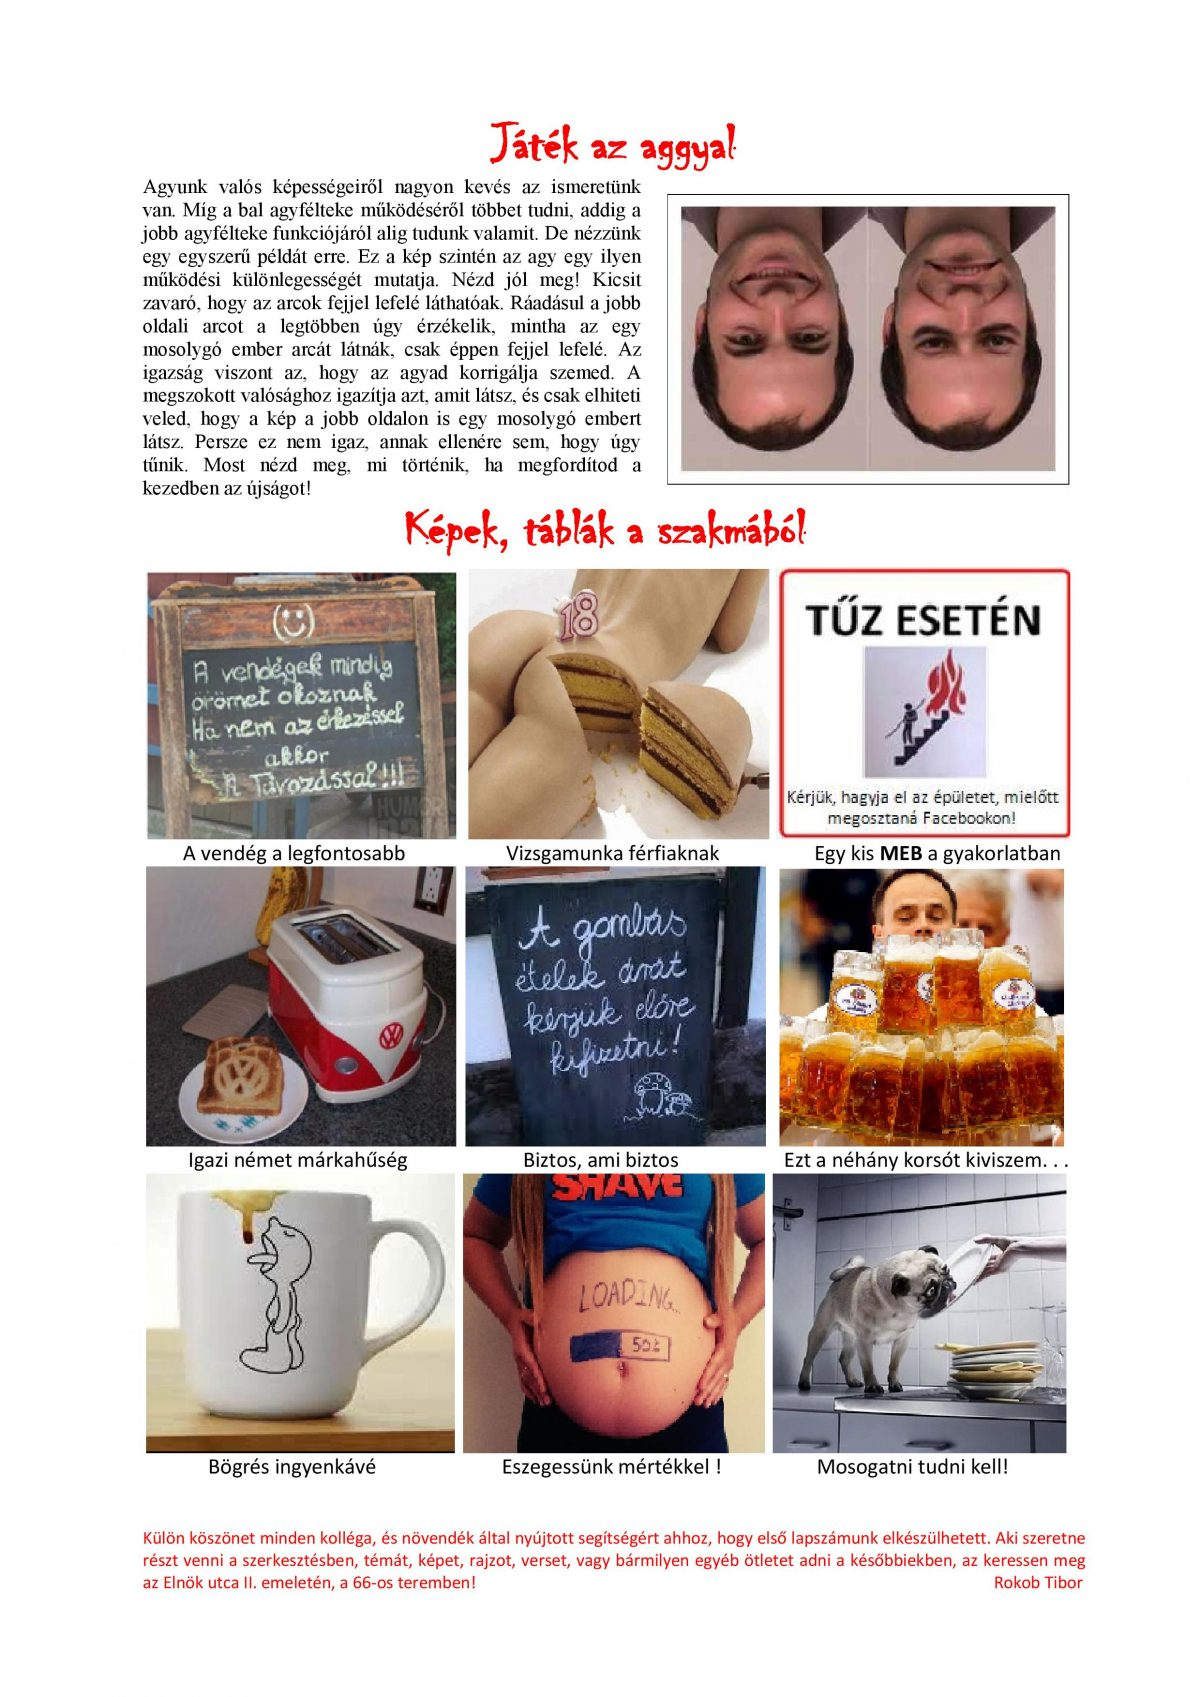 http://mandysuli.bkszc.hu/wp-content/uploads/2016/09/20.-oldal-hítlap-page-001-1200x1697.jpg